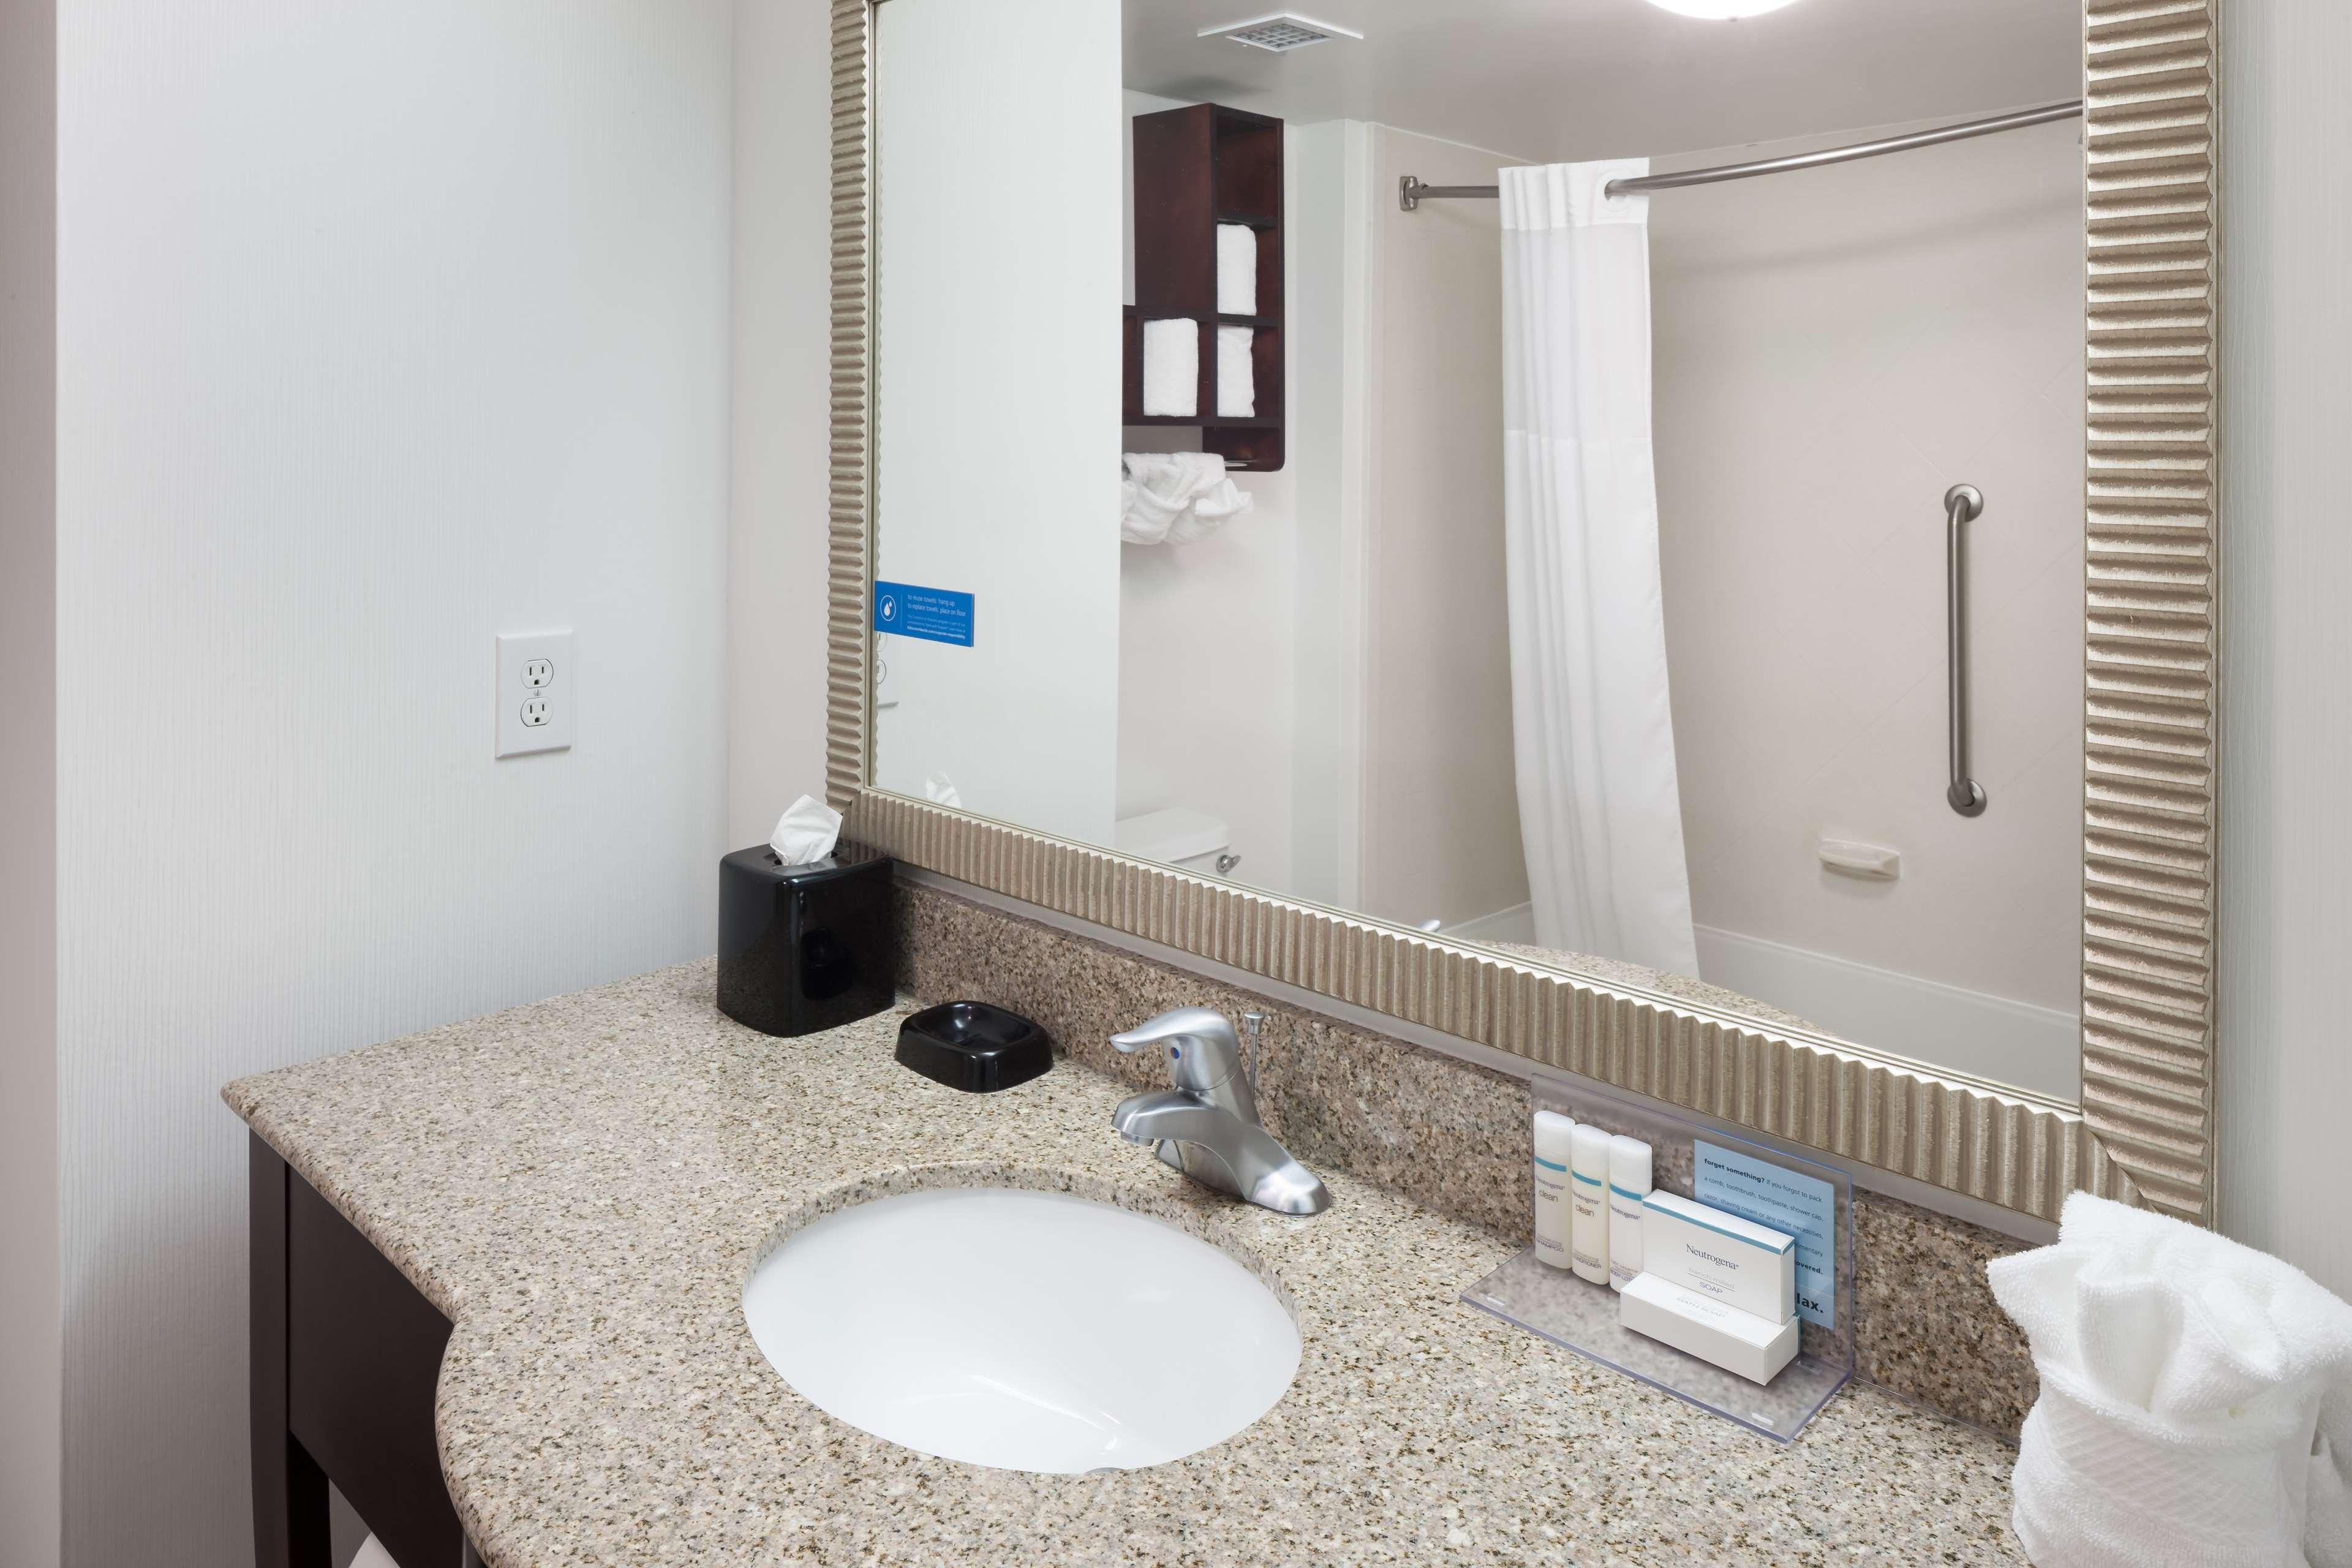 Hampton Inn & Suites Panama City Beach-Pier Park Area image 13